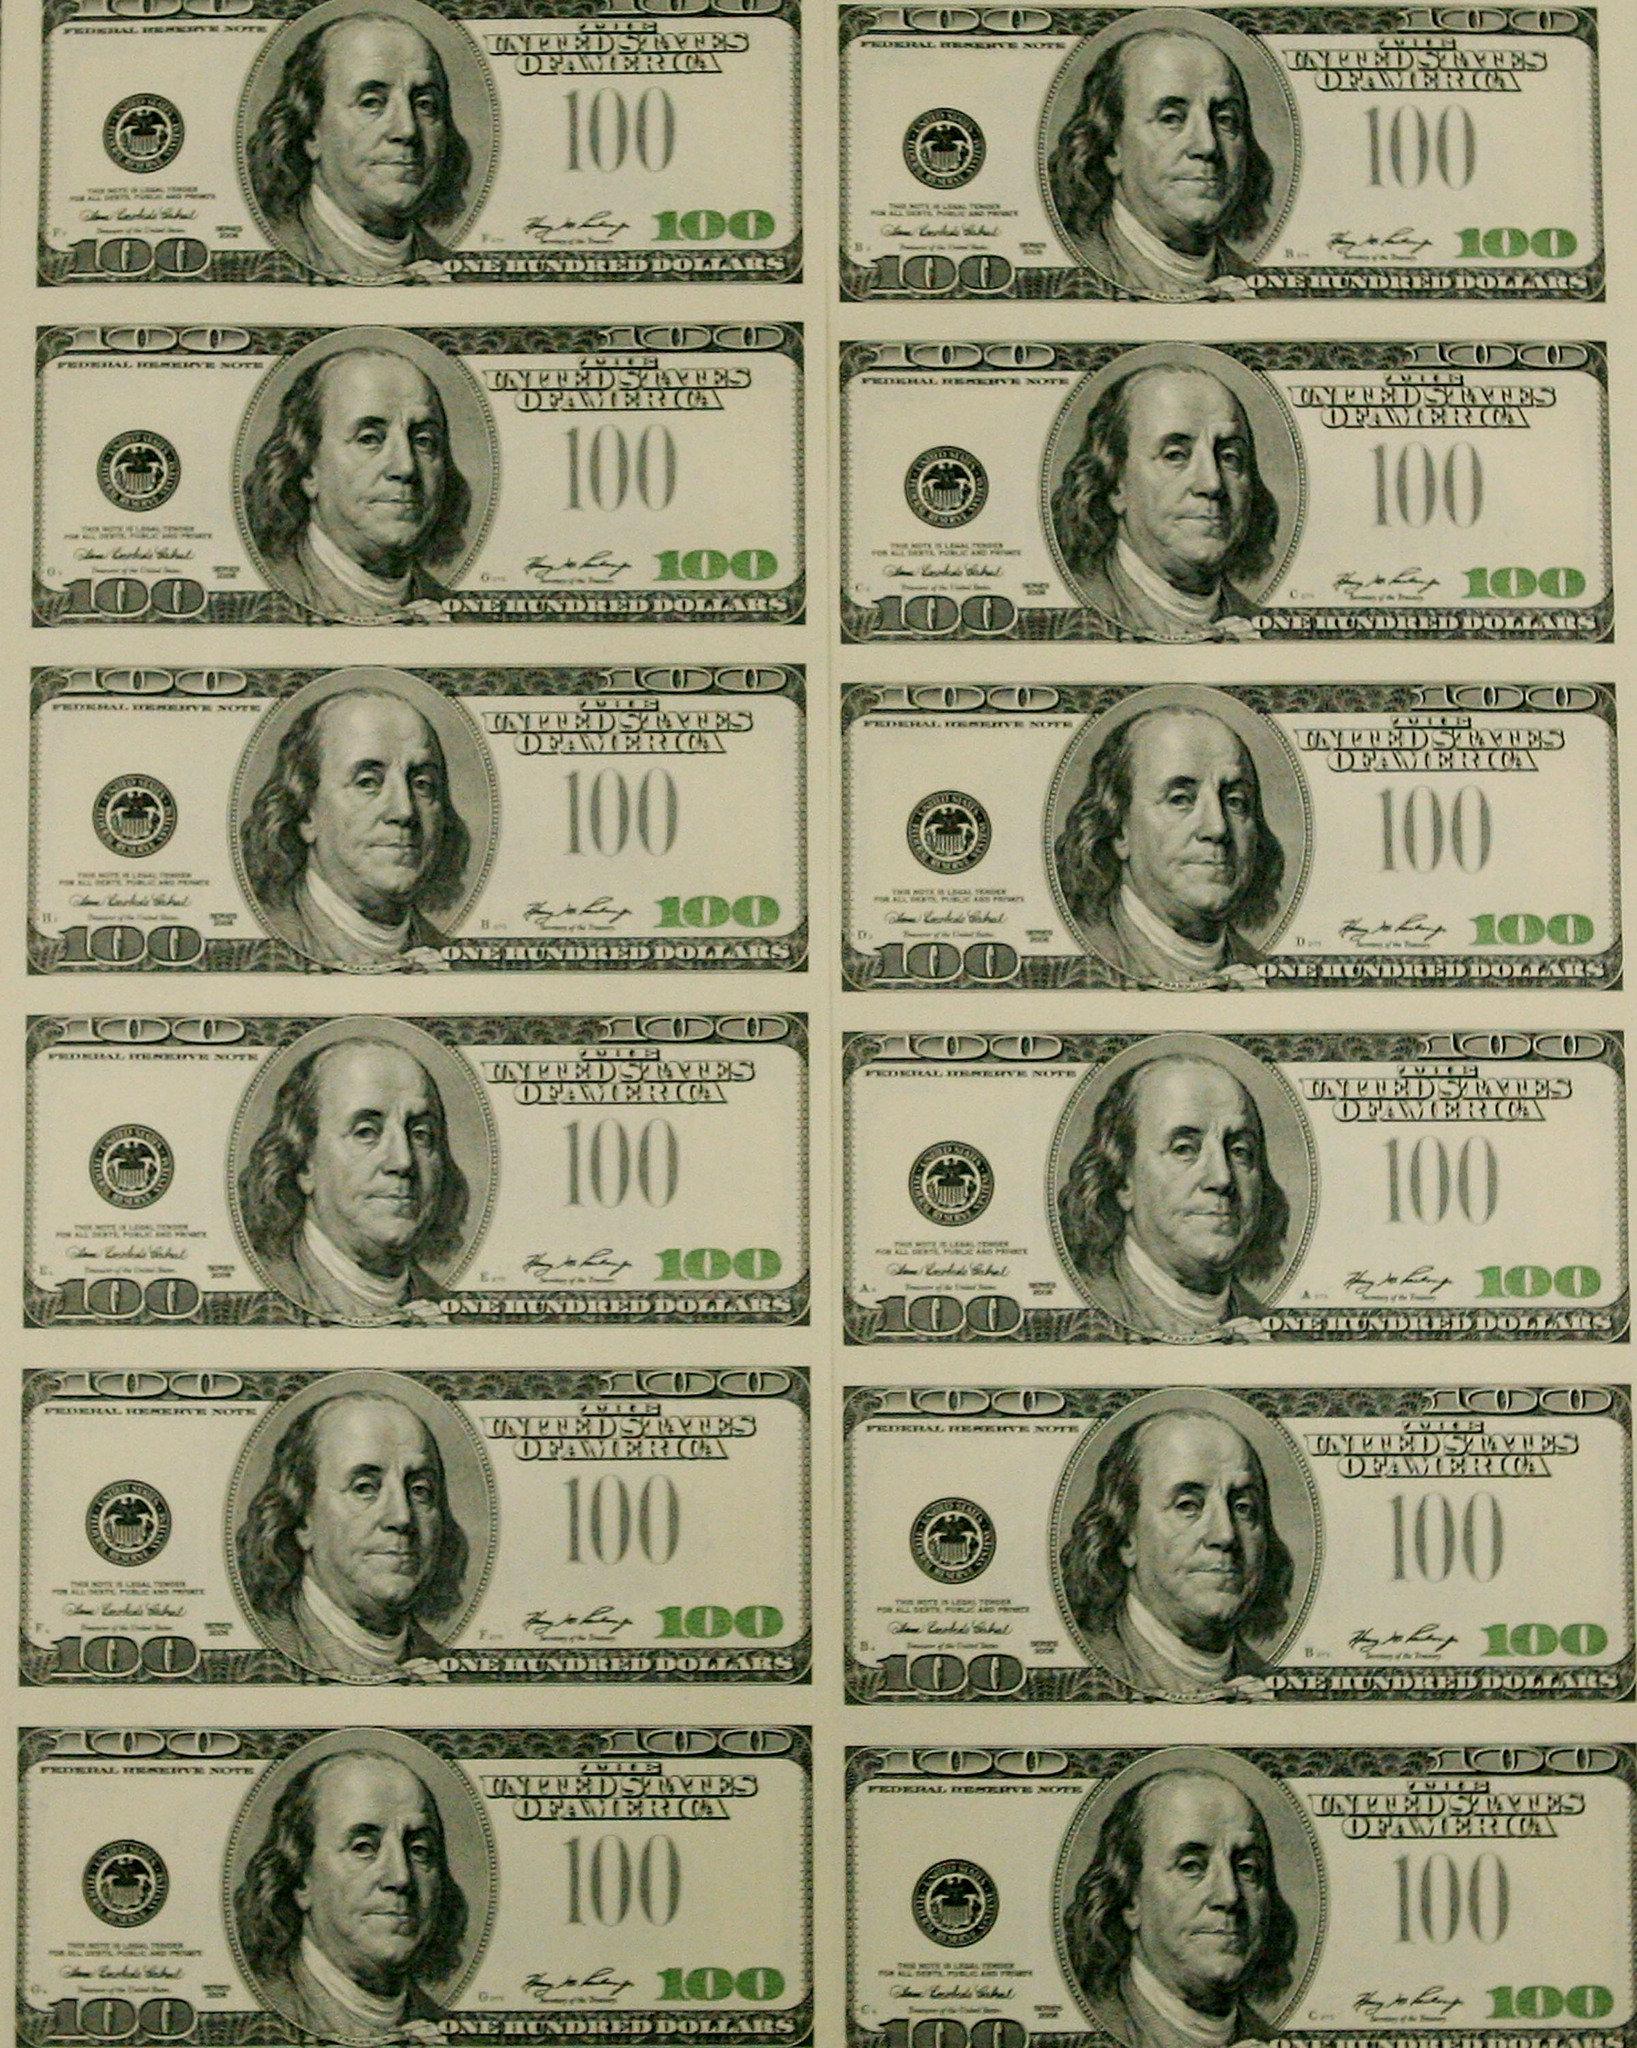 5 Images of Printable Fake Money Bills